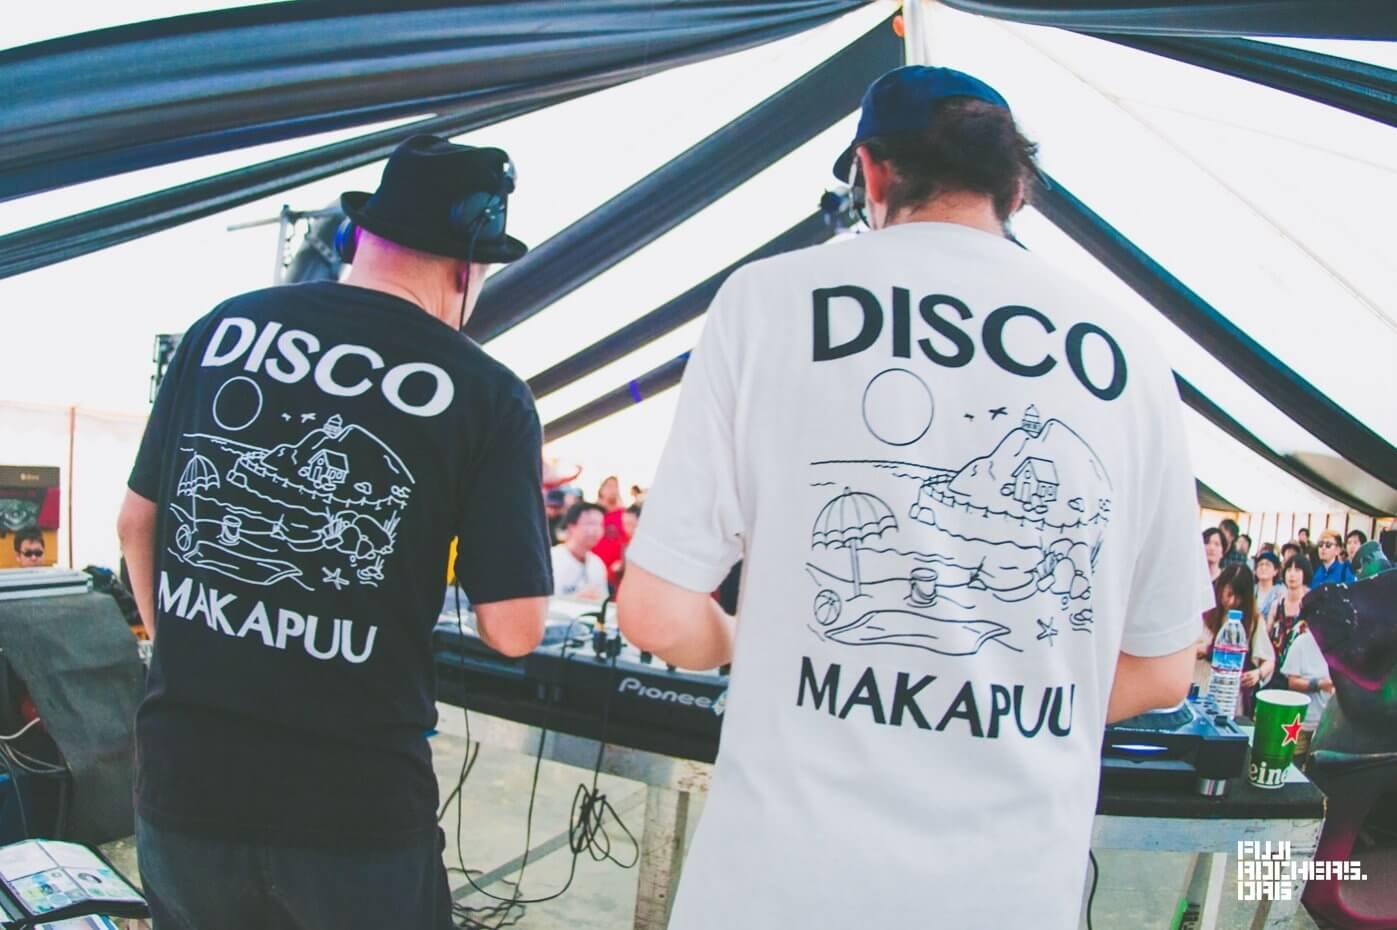 "DISCO MAKAPU'U(川辺ヒロシ / サイトウ""JxJx""ジュン)"